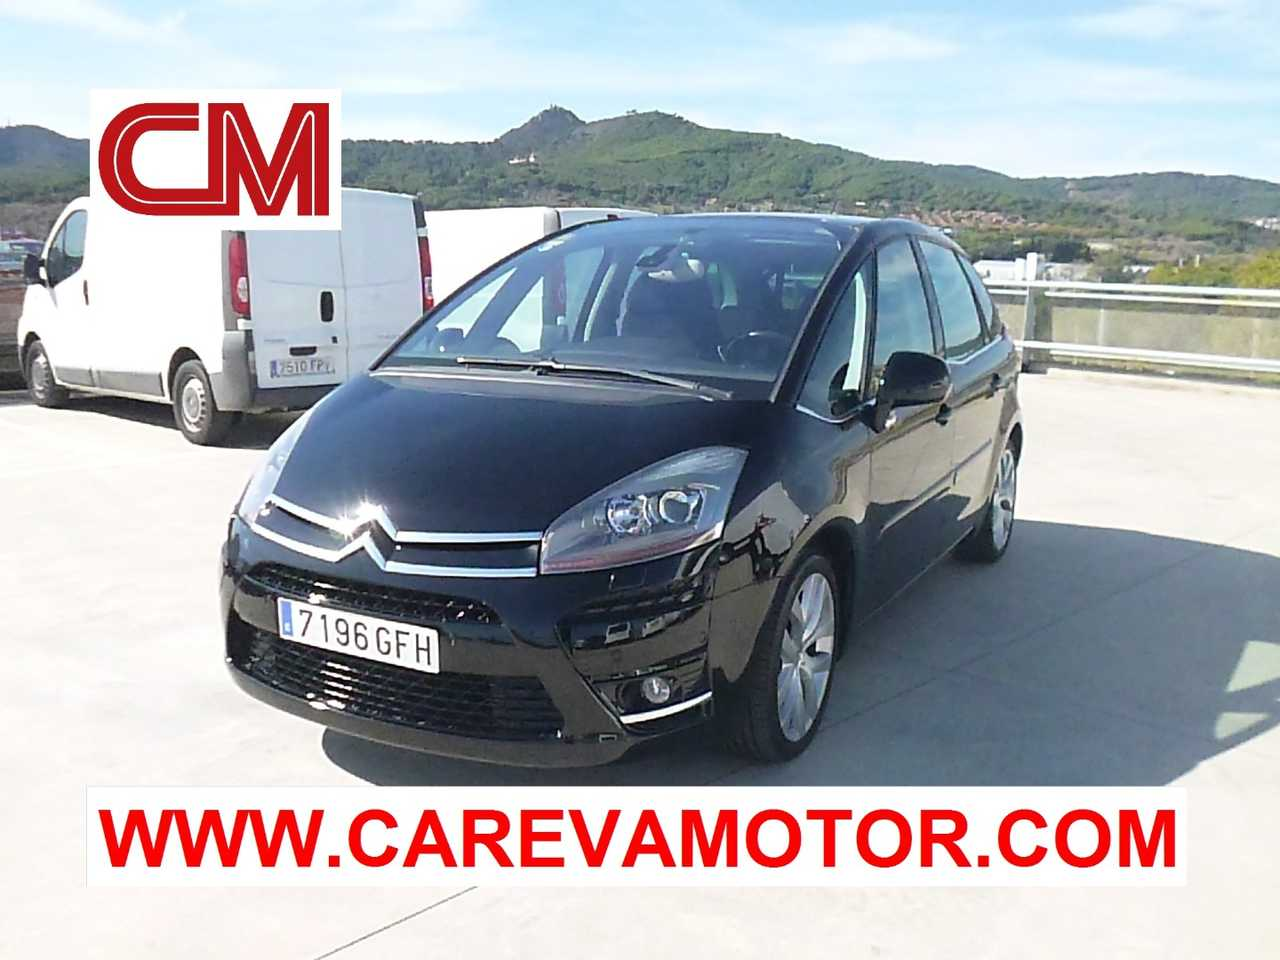 Citroën C4 Picasso 2.0 HDI 138CV CMP EXCLUSIVE 5P   - Foto 1